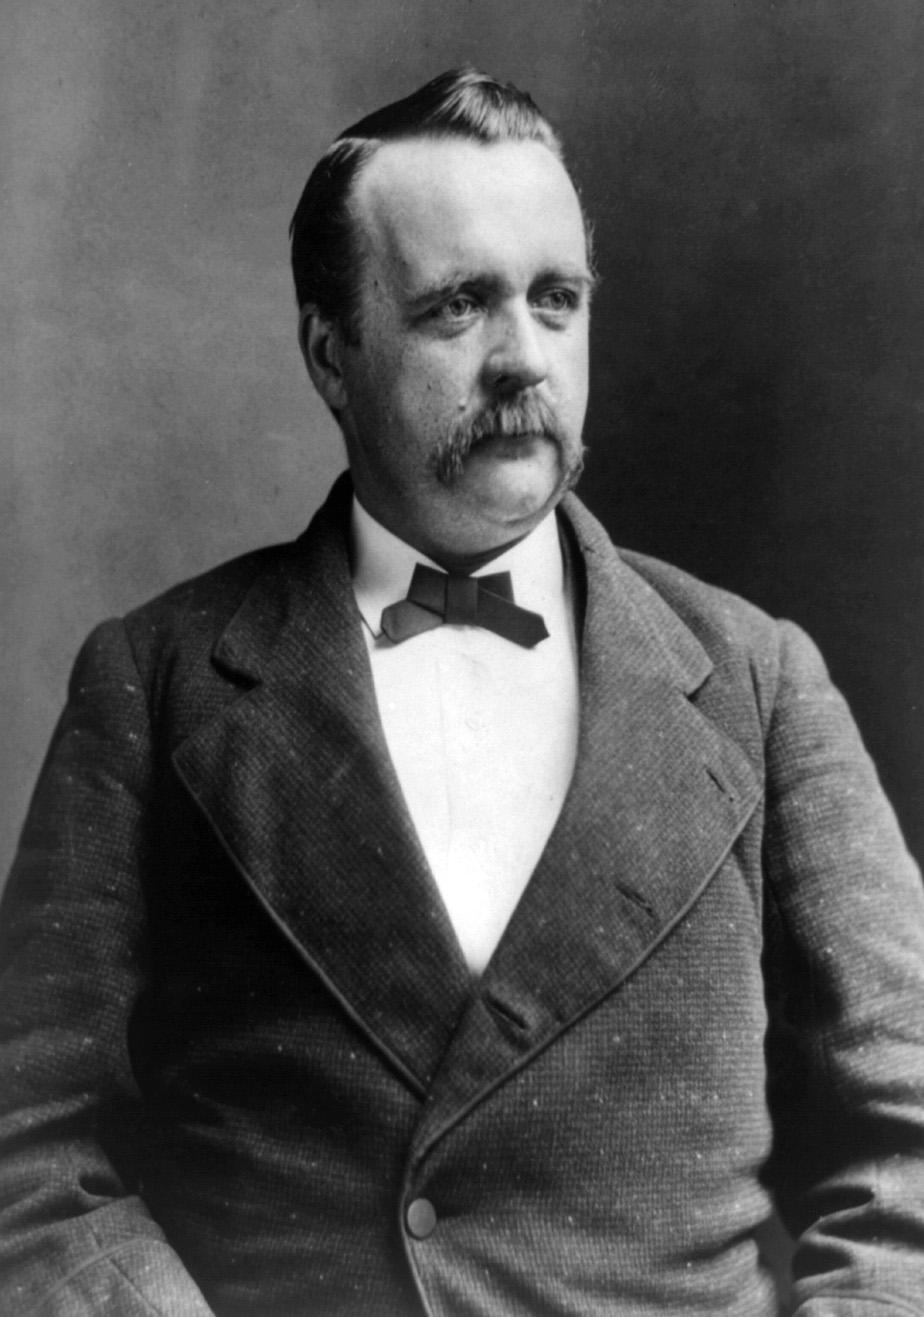 Justus H. Rathbone (1838-1889)